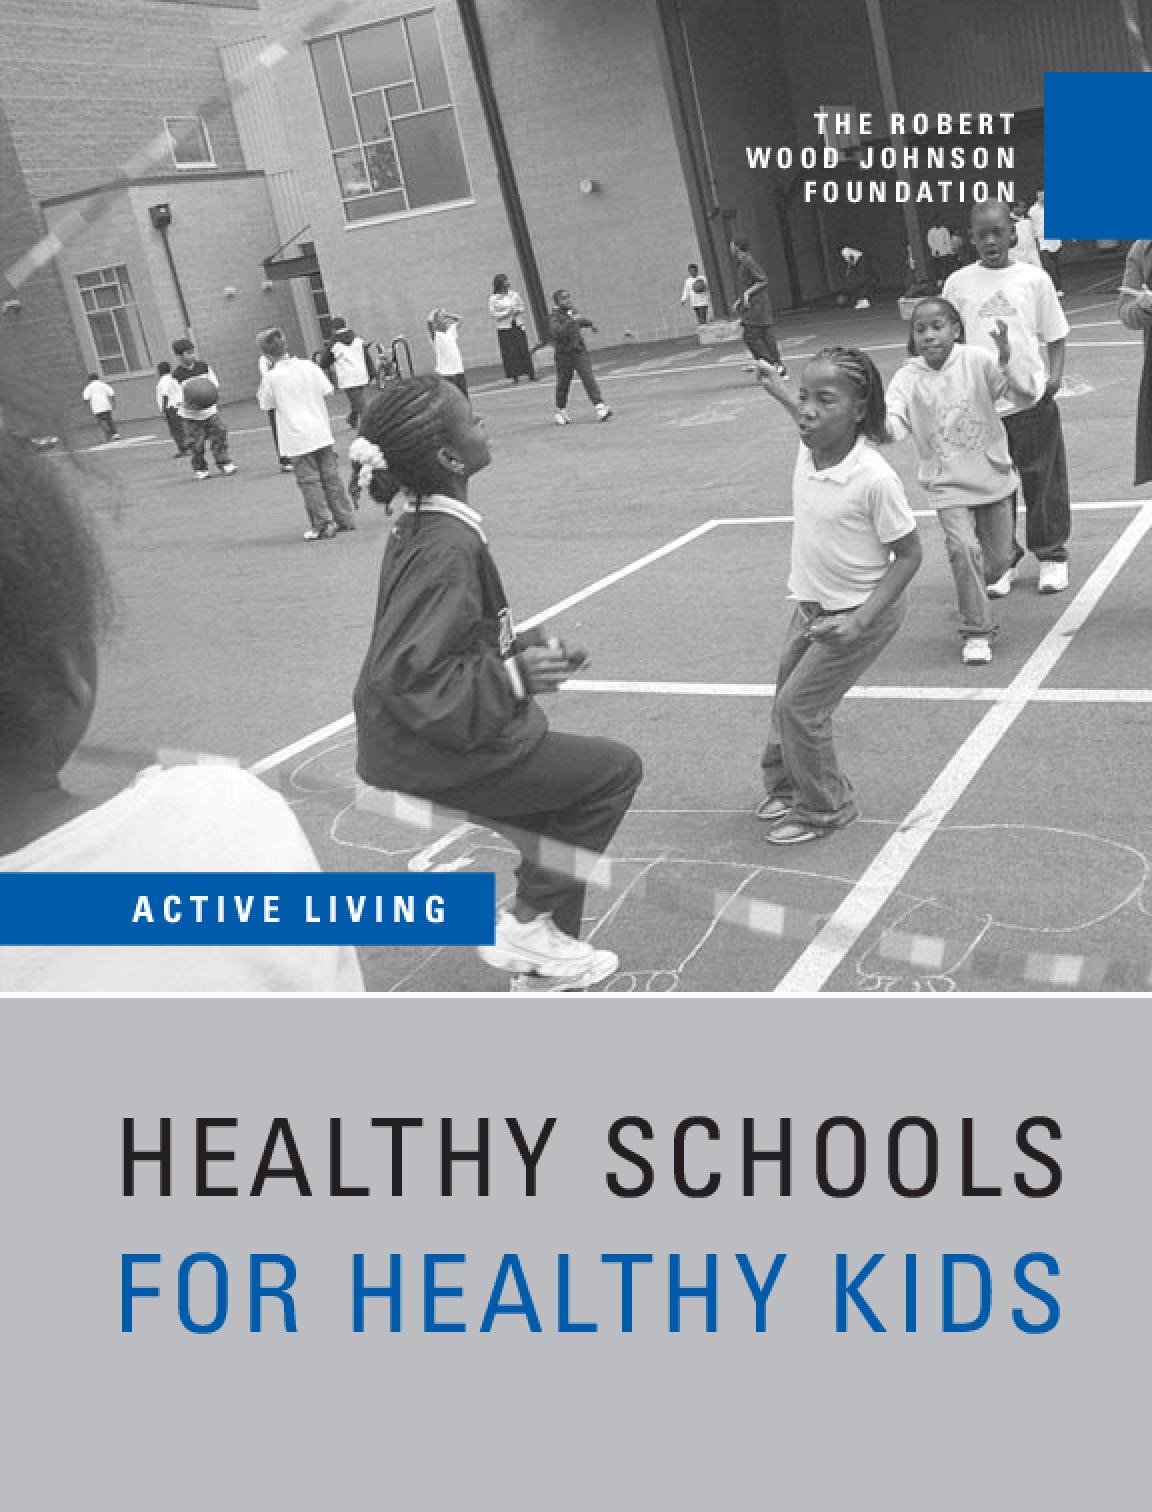 Healthy Schools for Healthy Kids